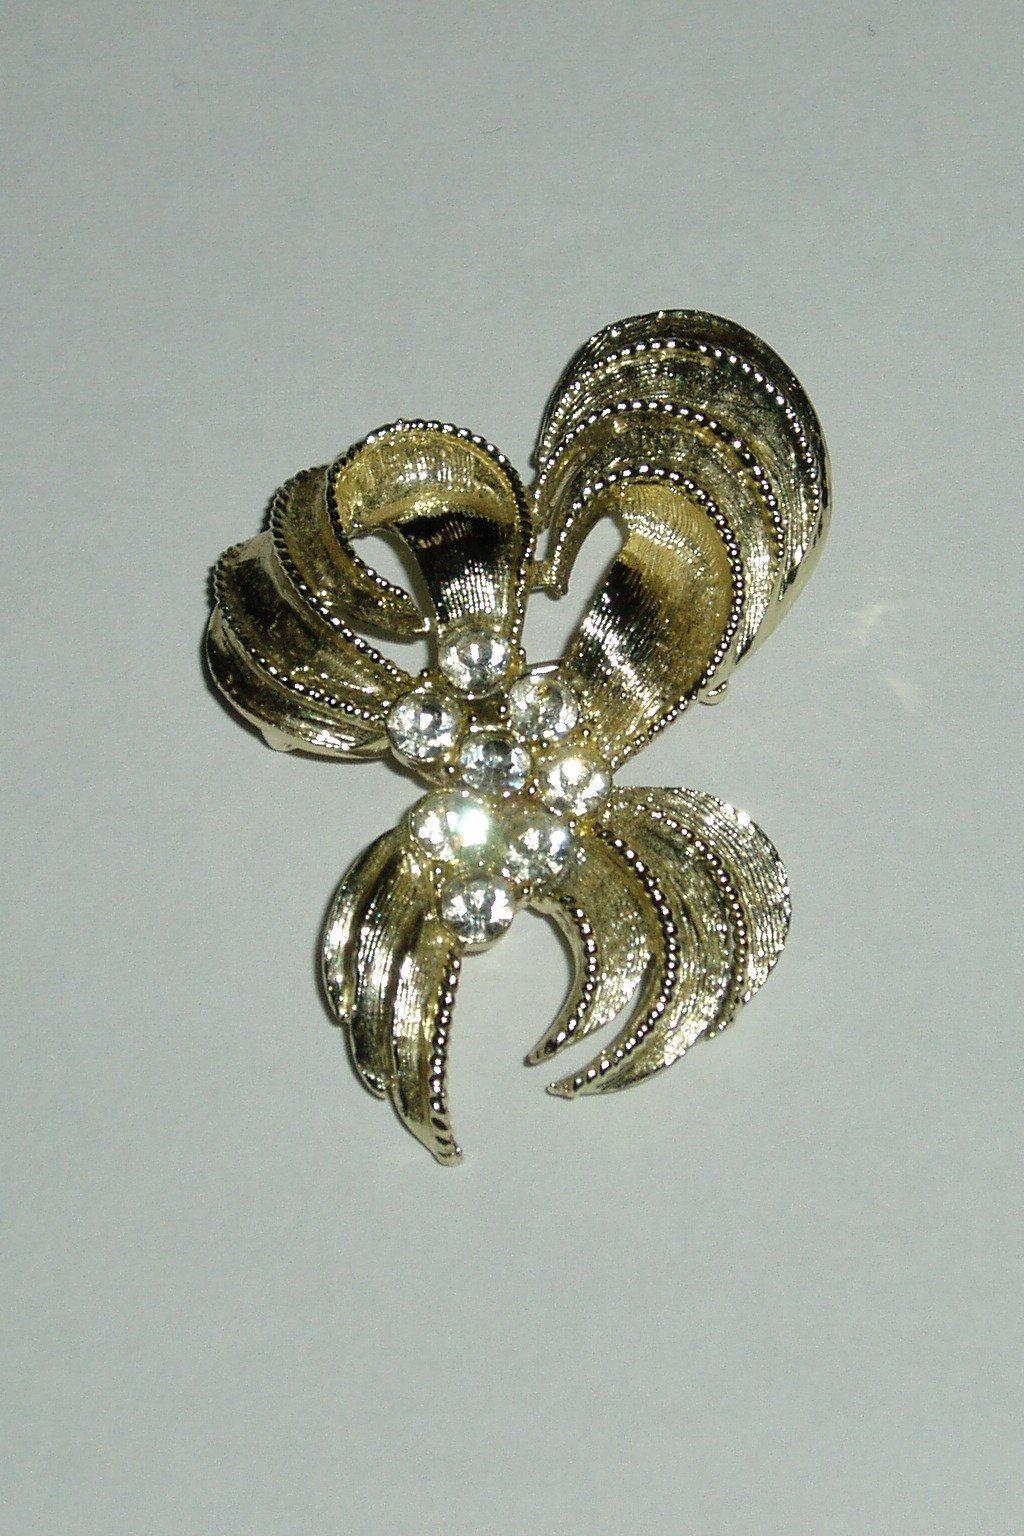 c626a291c35 vintage brooch - retro pin - gold tone jewellery - crystal brooch - bow tie  brooch - womens jewellery - retro fashion - costume jewellery